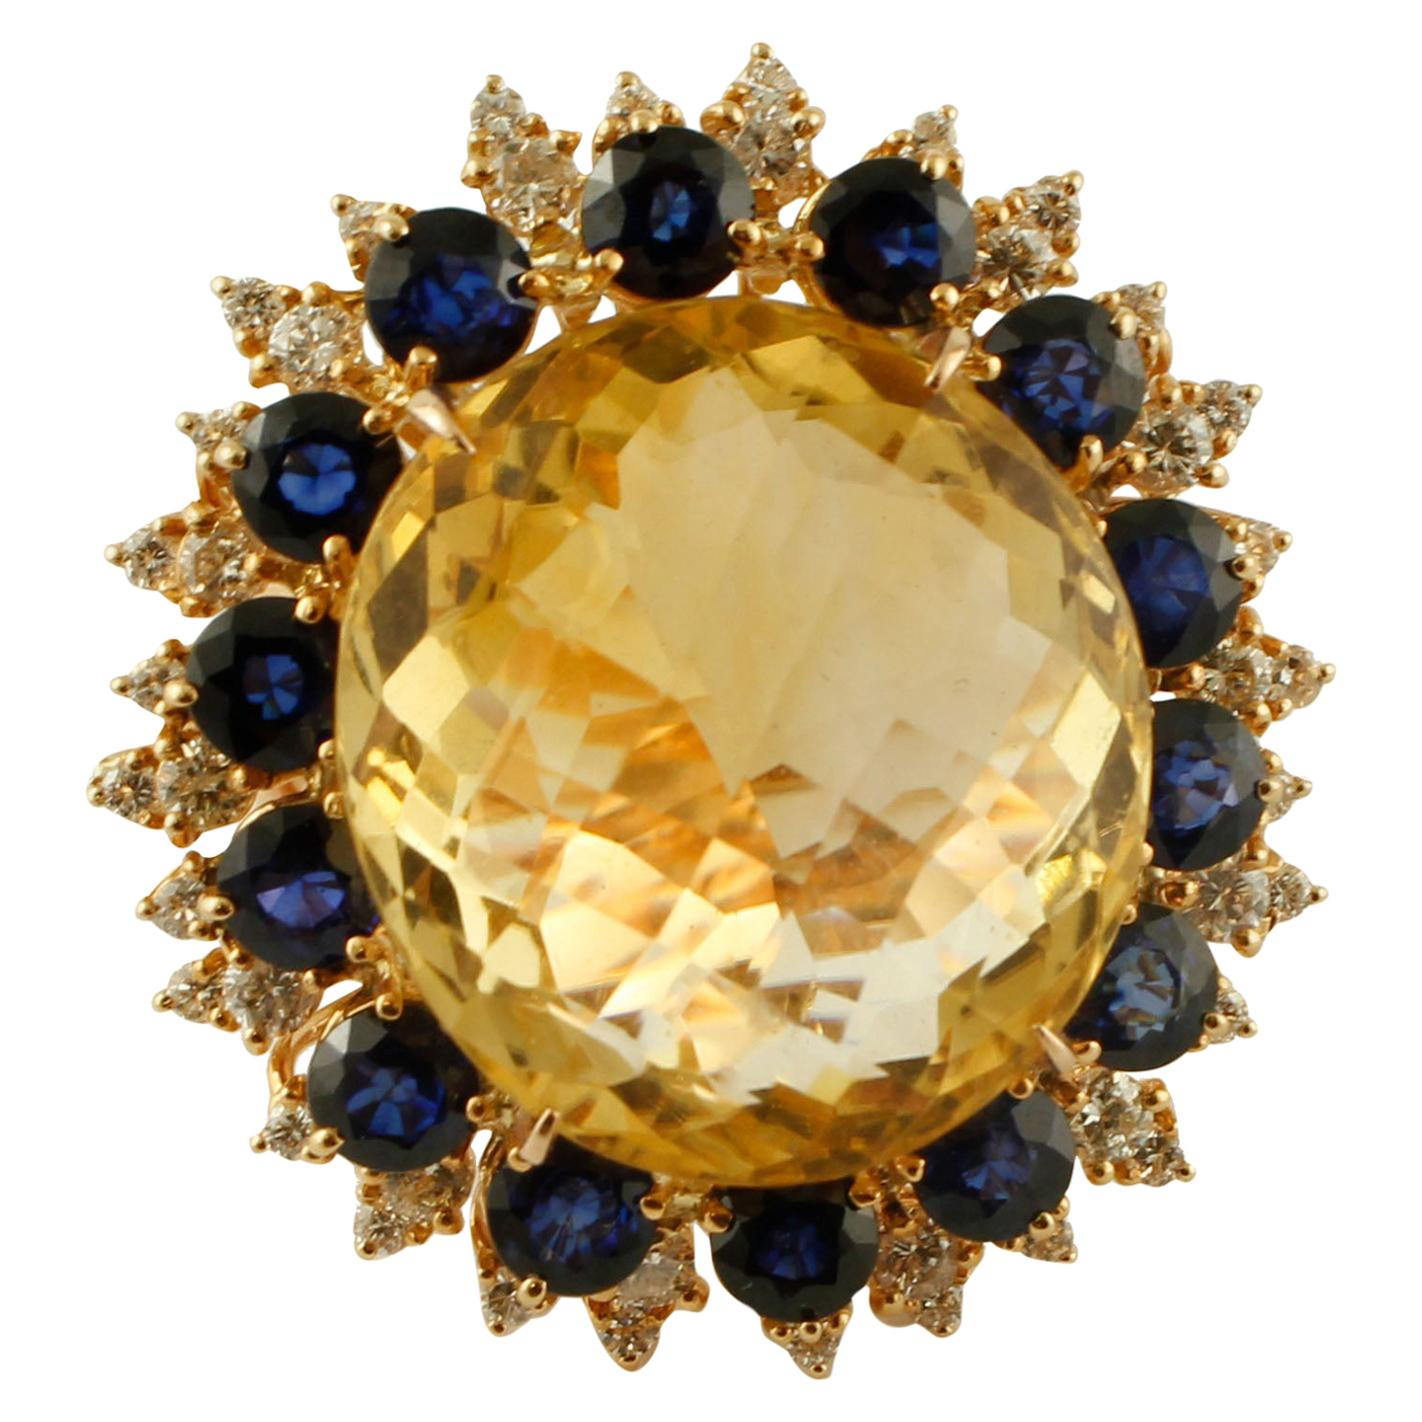 Big Yellow Topaz, Diamonds, Blue Sapphires, 18 Karat Rose Gold Vintage Ring